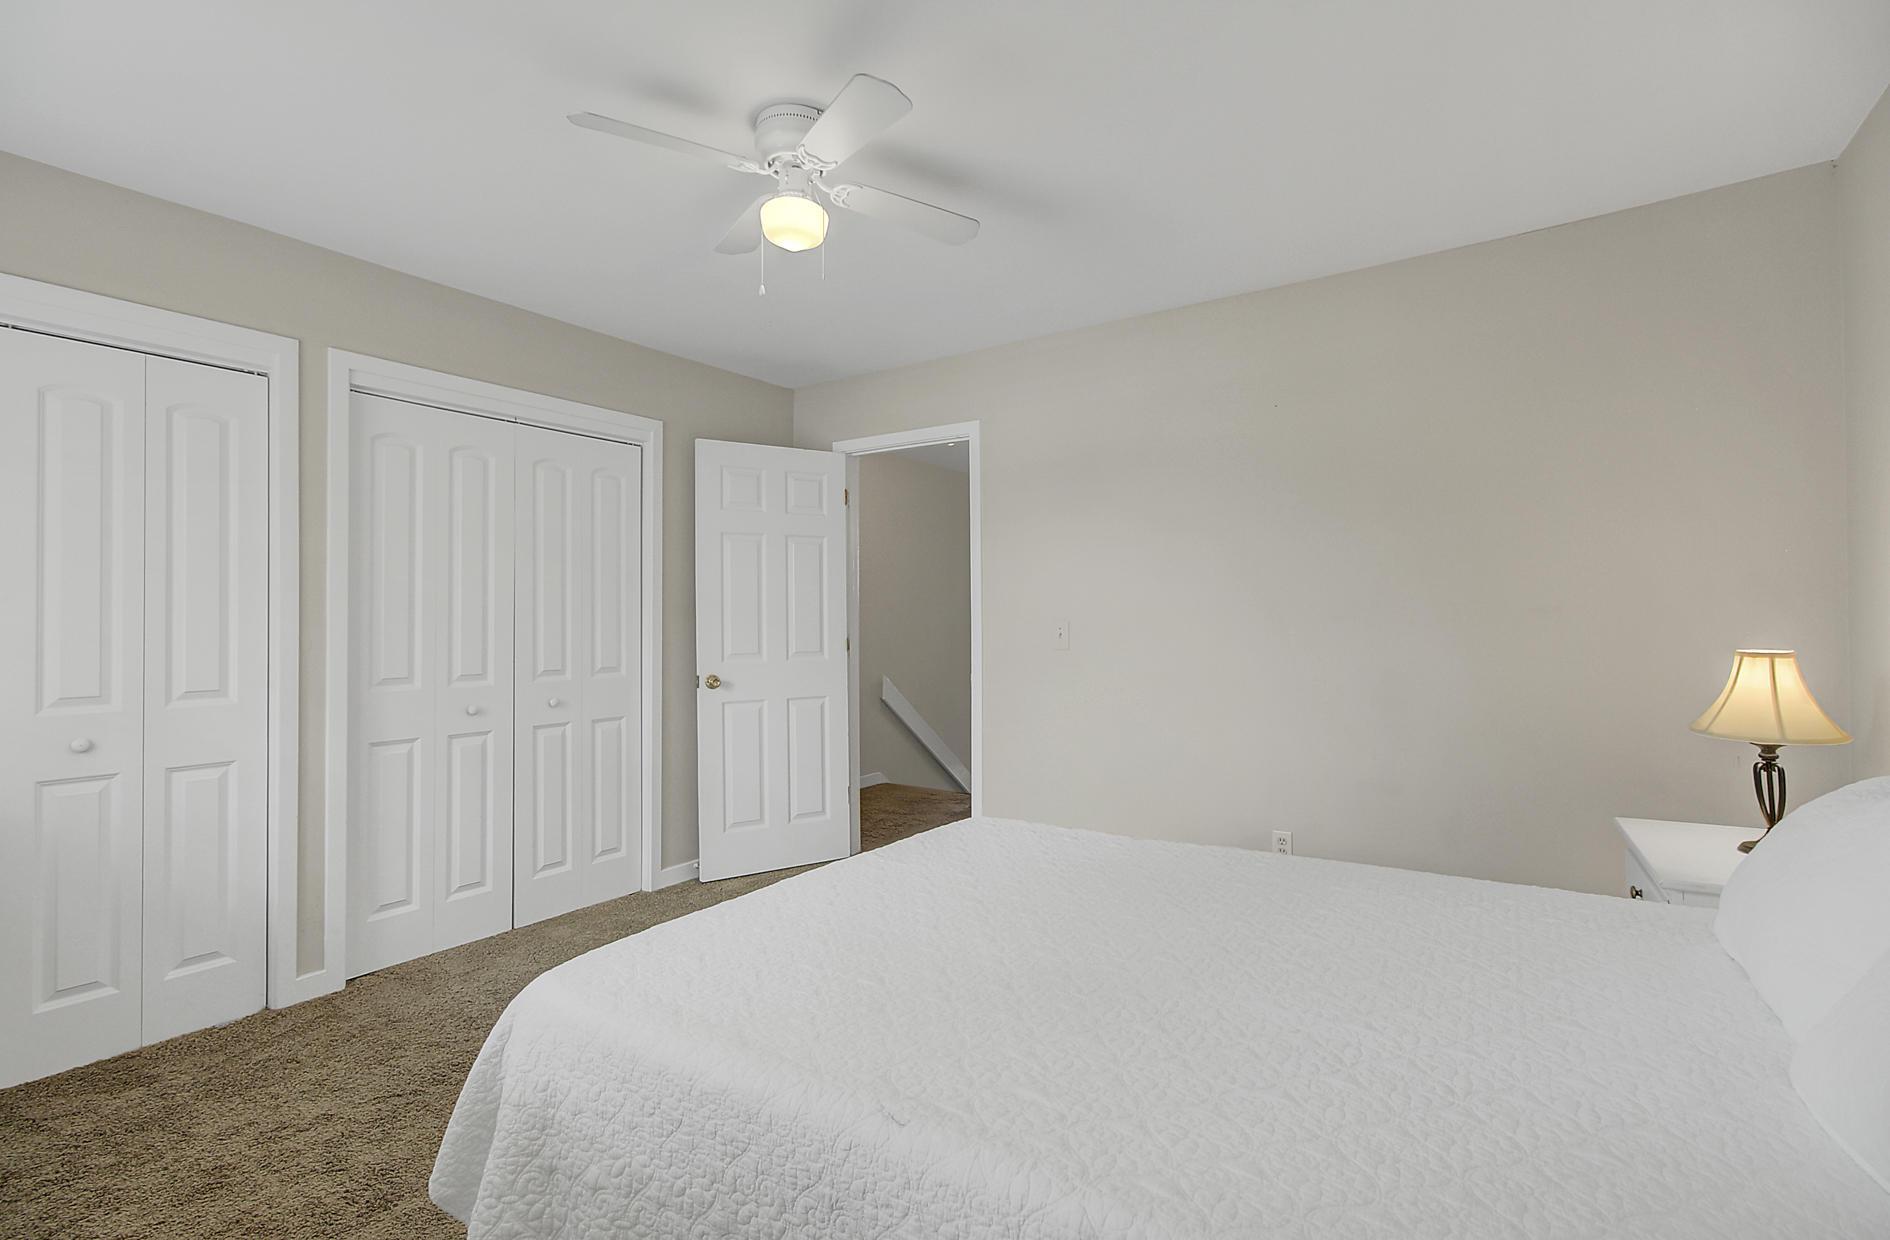 Riverland Place Homes For Sale - 234 Stefan, Charleston, SC - 6